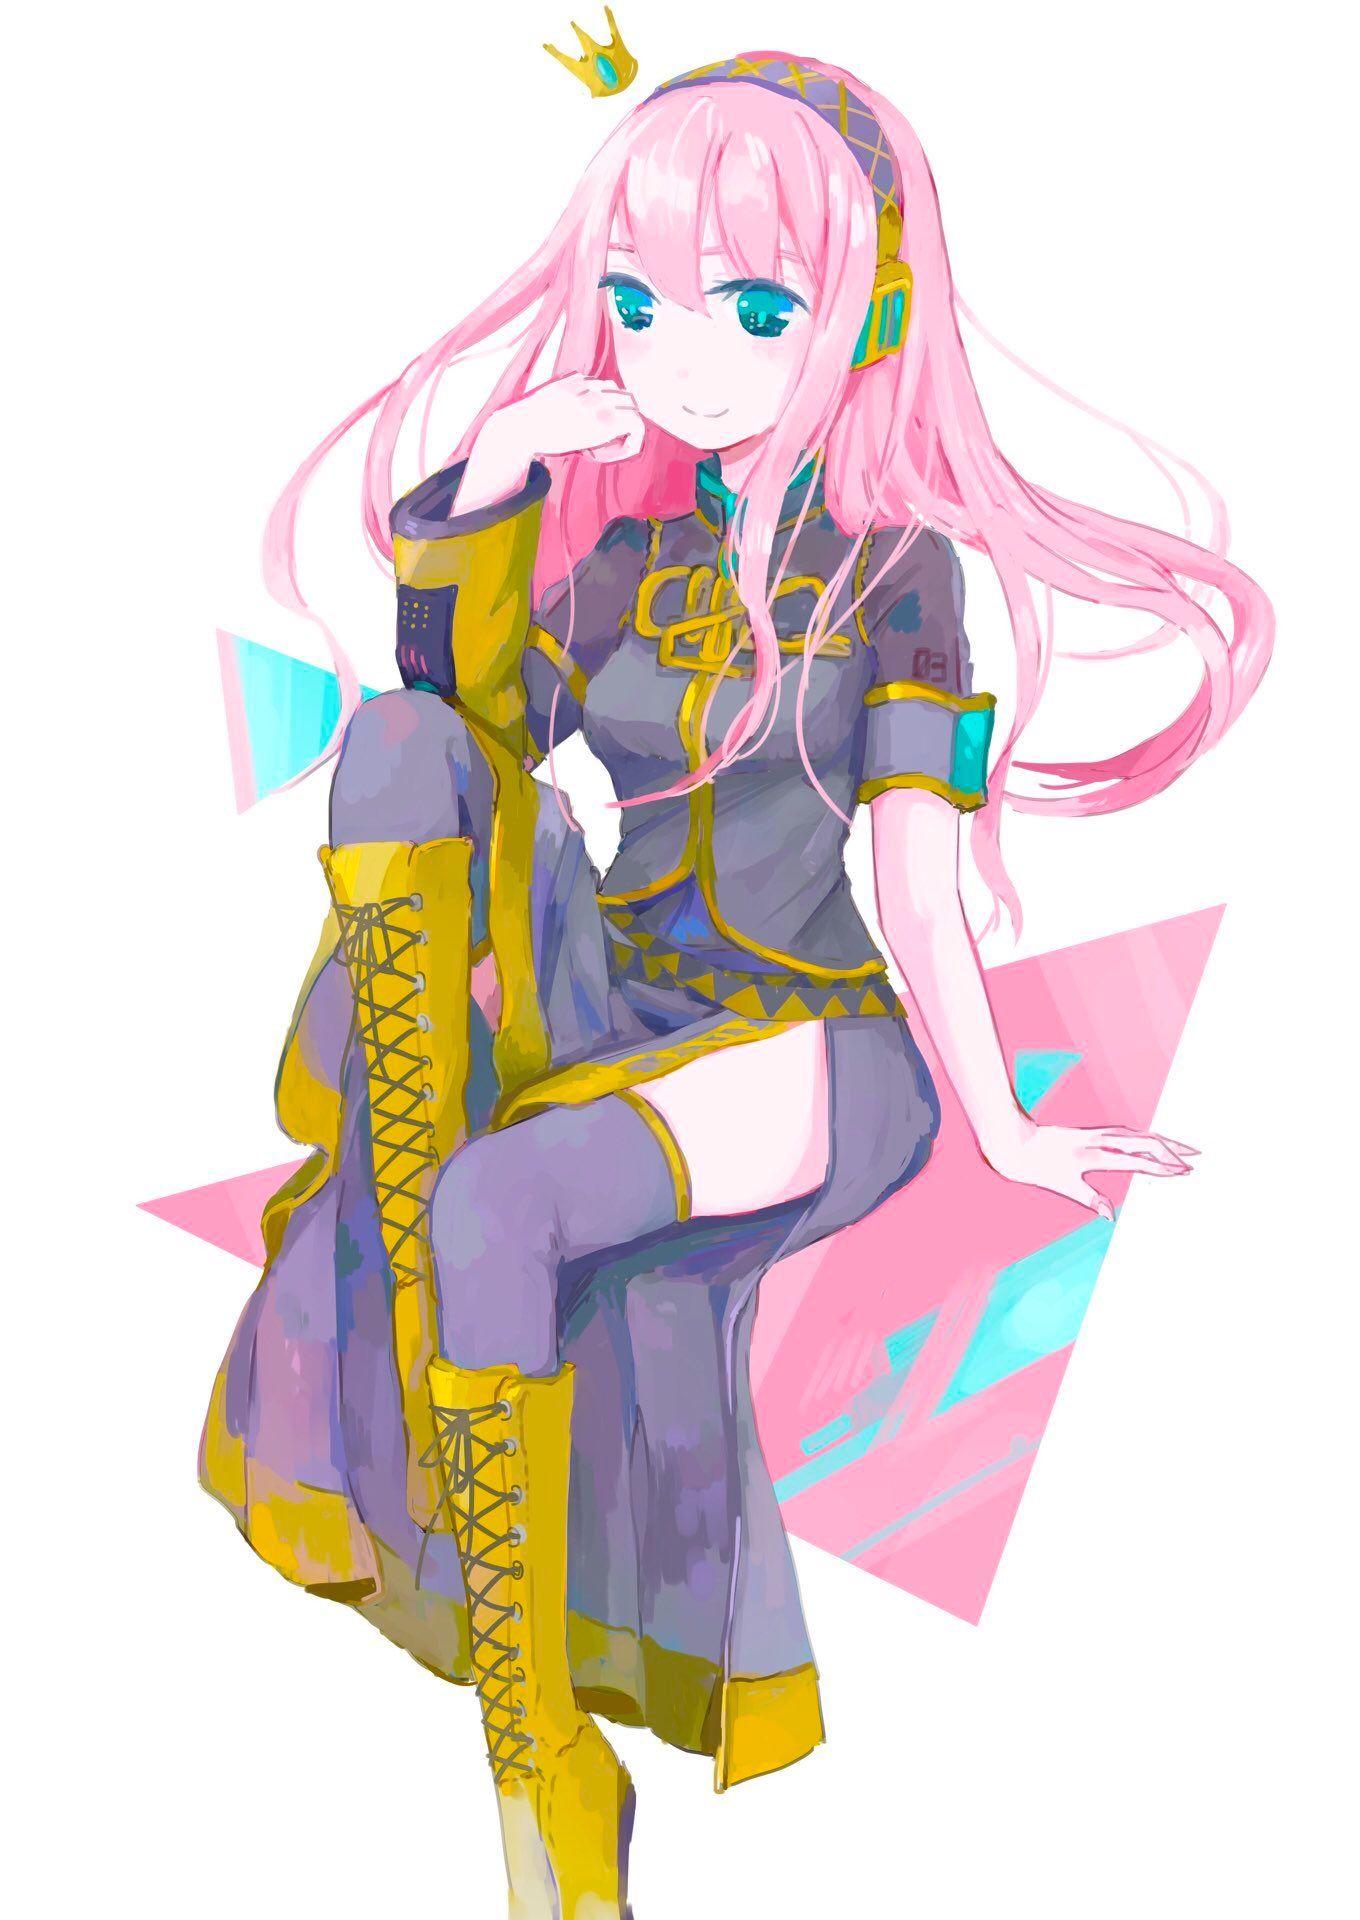 Pin by Noir on Vocaloids ボーカロイド Vocaloid, Hatsune miku, Miku